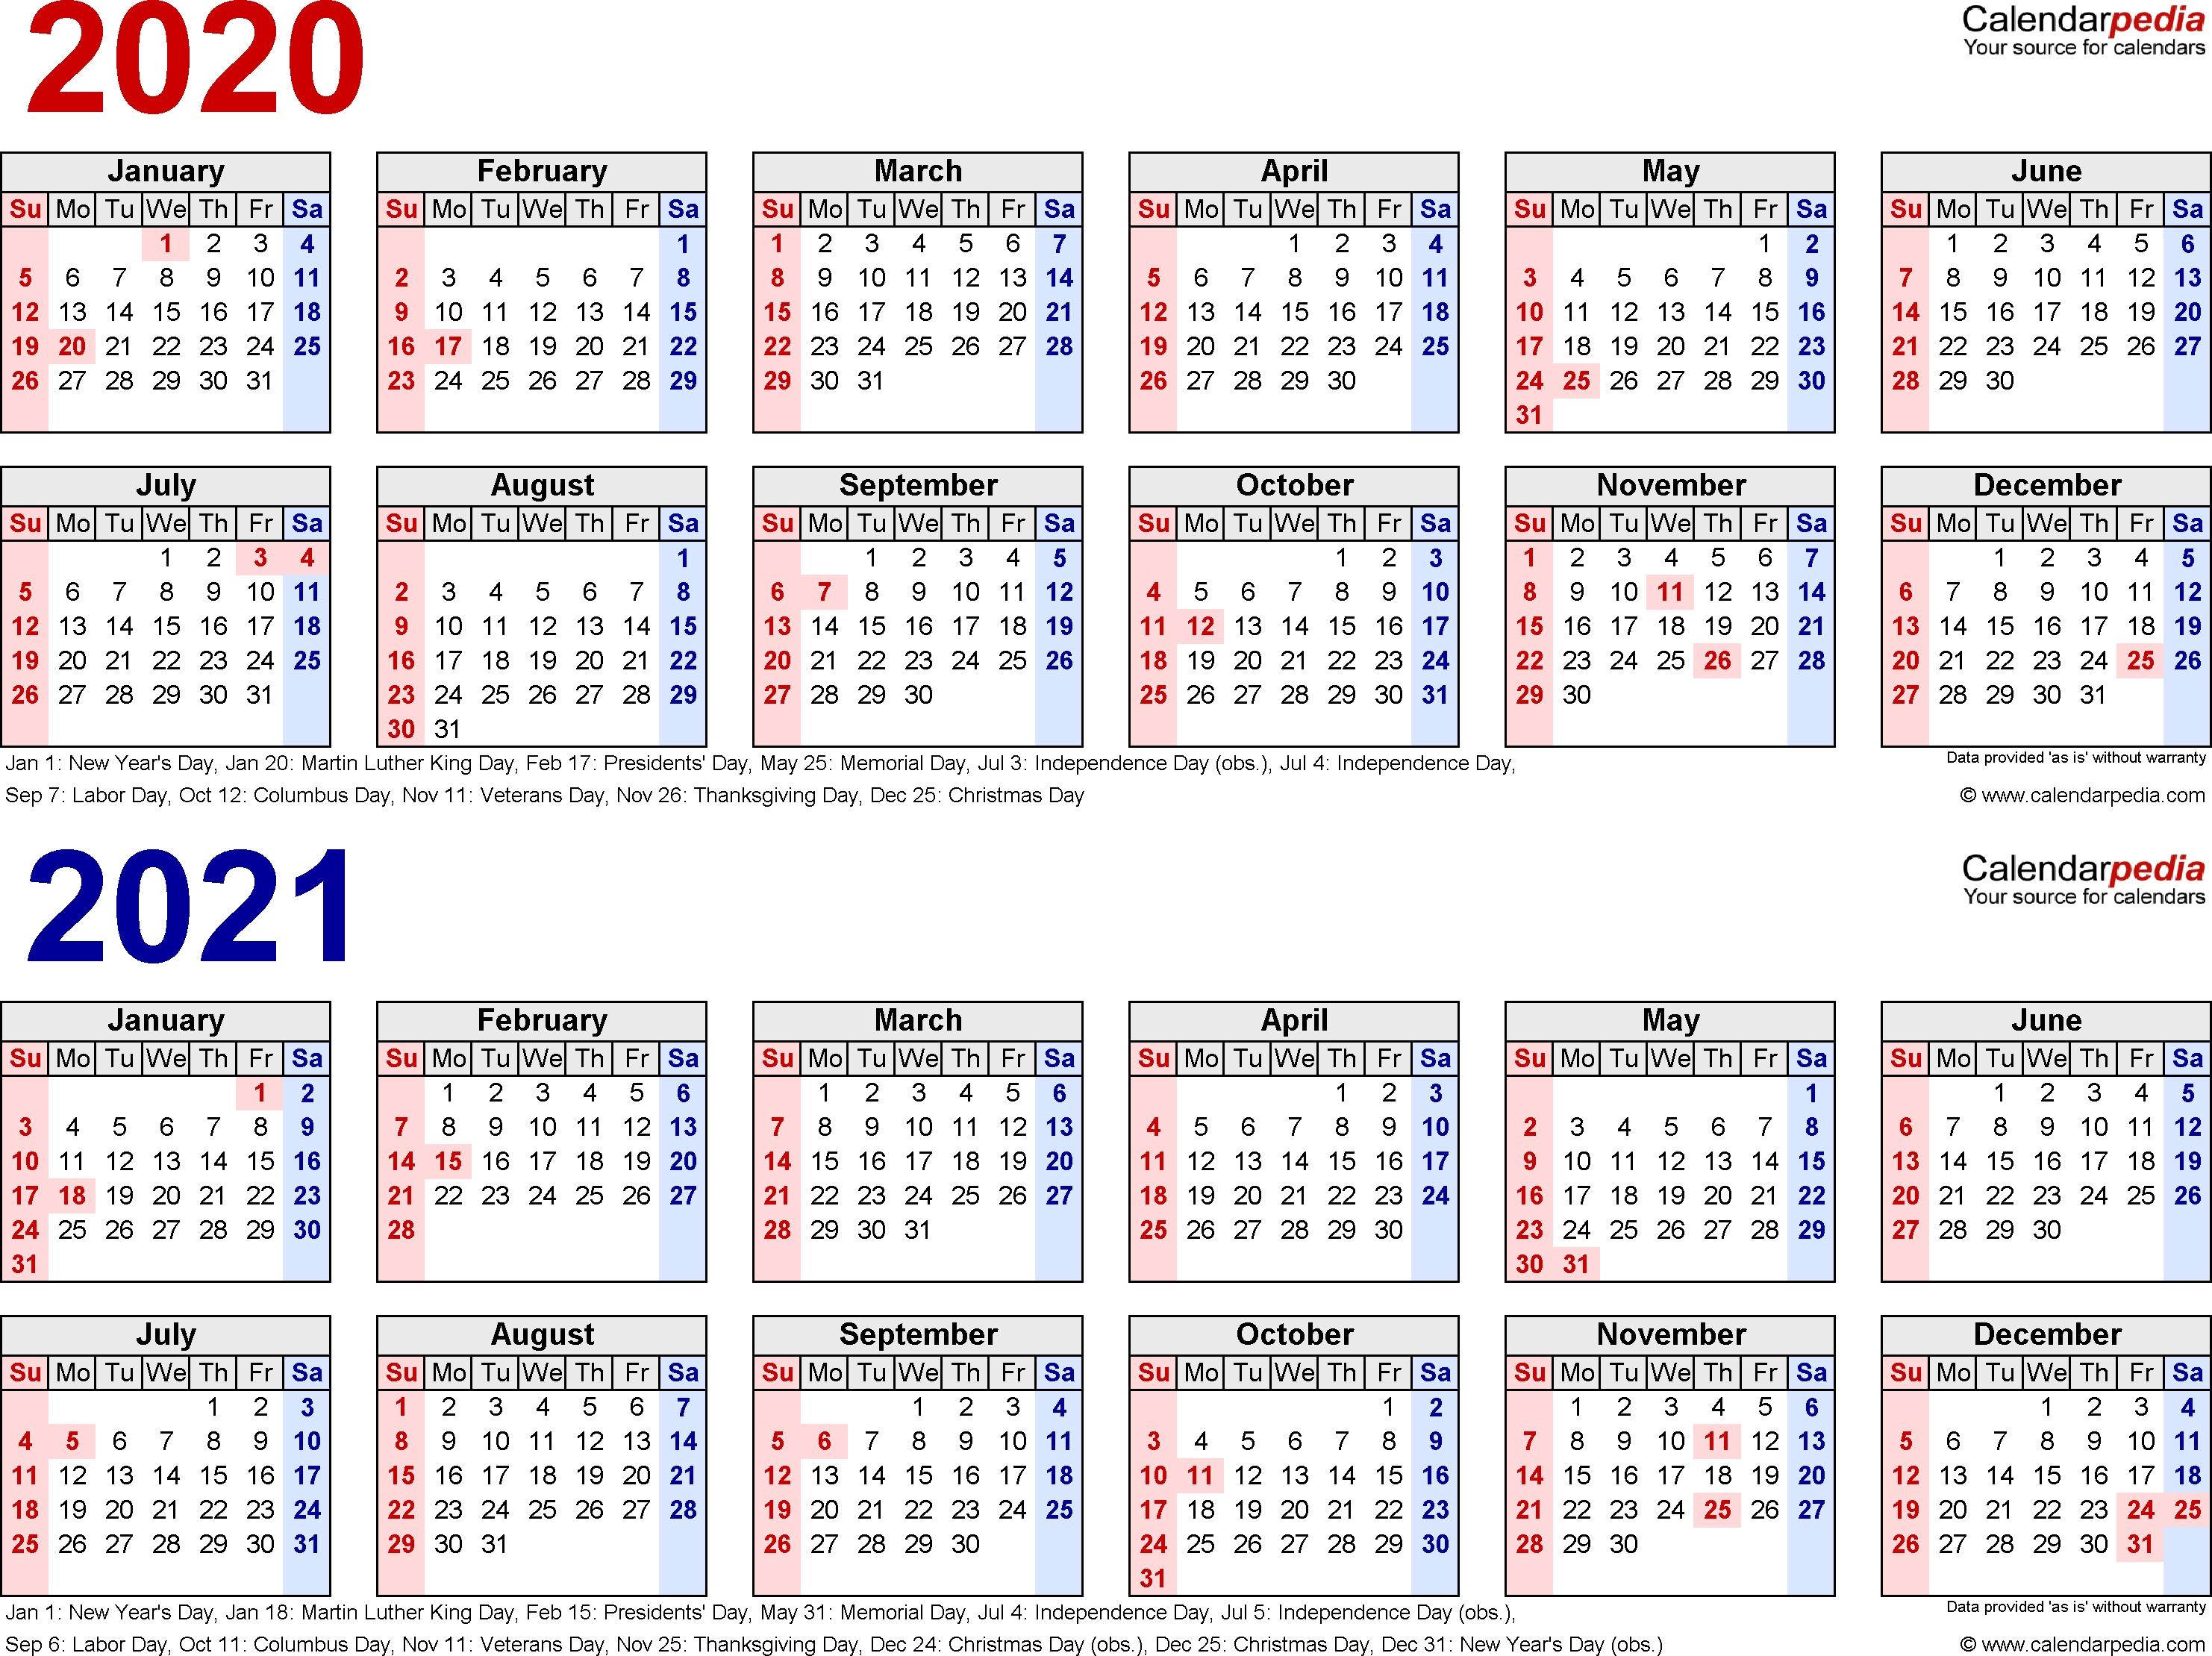 2020-2021 Two Year Calendar - Free Printable Microsoft Word Incredible 2 Year Calendar 2020 And 2021